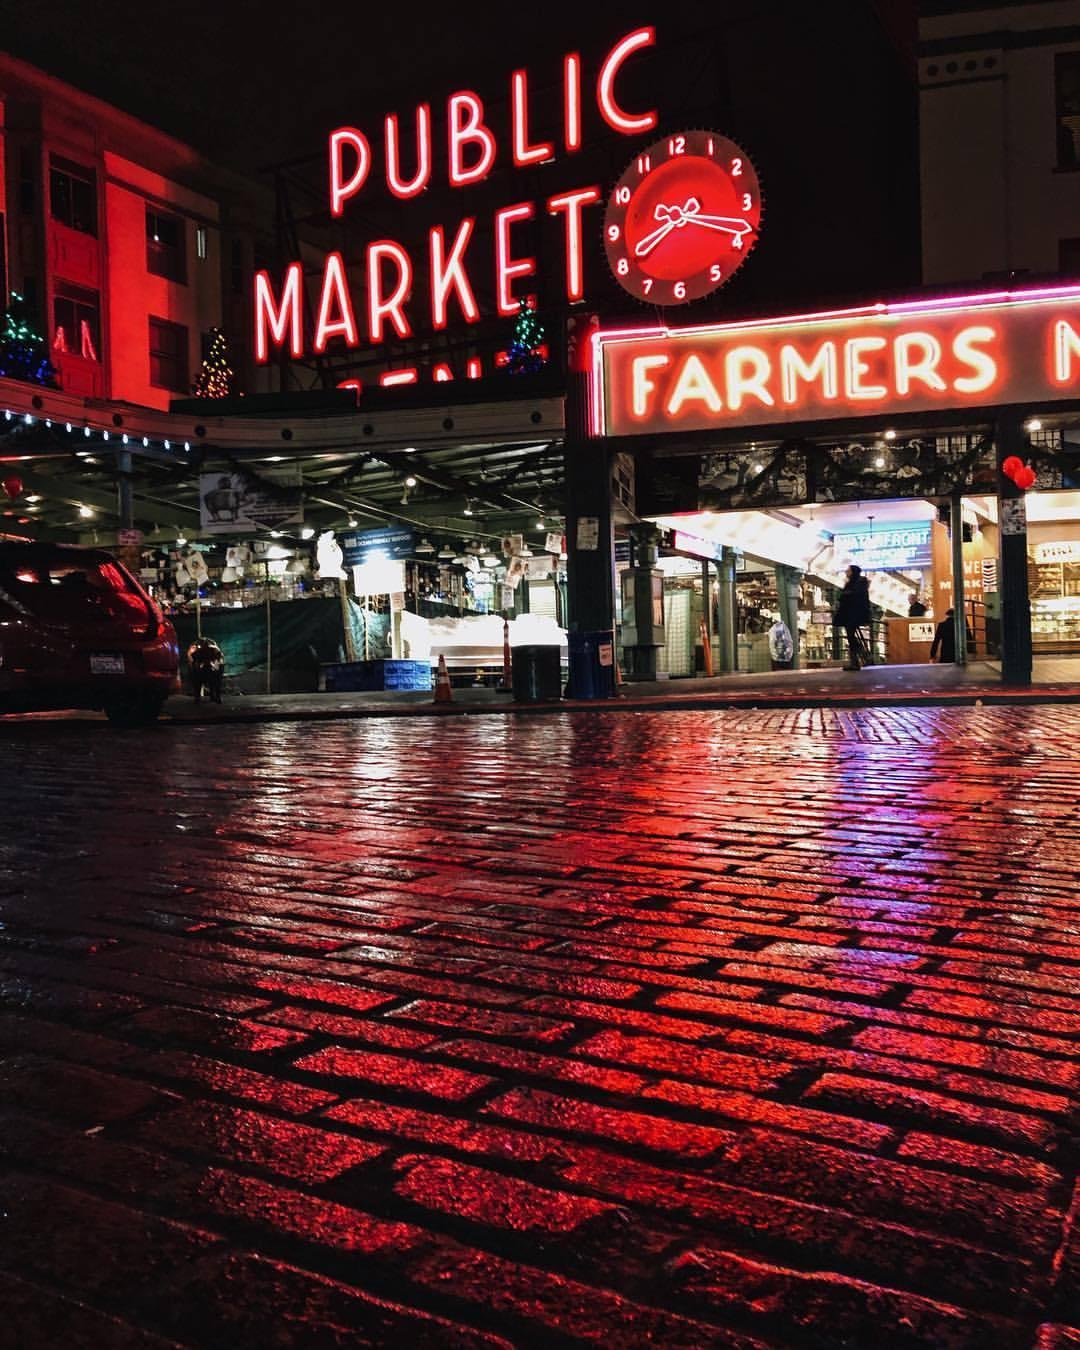 at Seattle, Washington